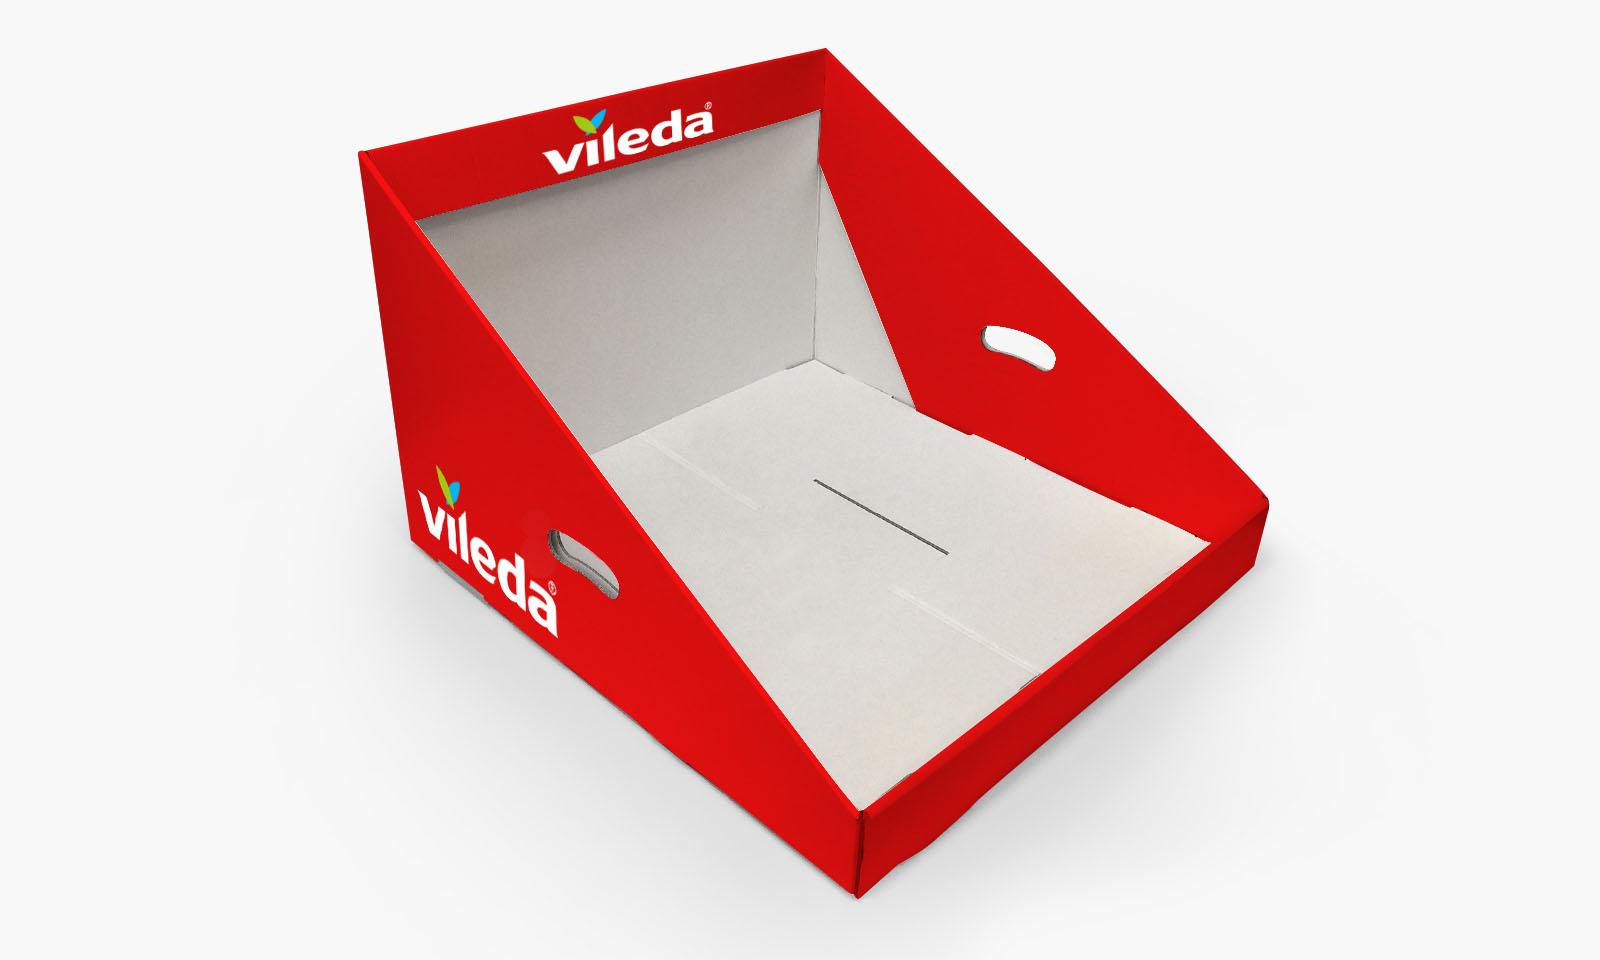 Ekspozytor produktowy Vileda